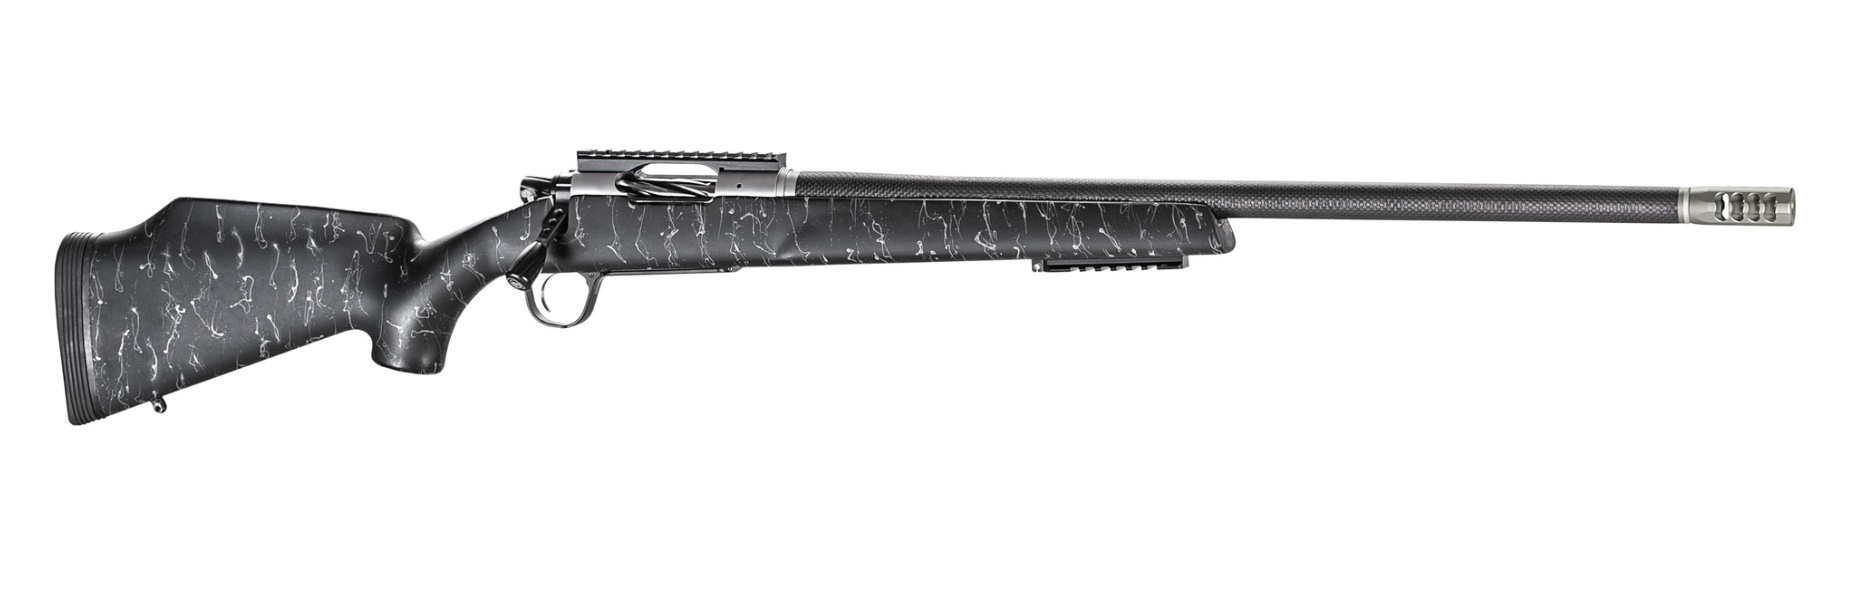 Christensen Arms Traverse 6.5 Creedmoor